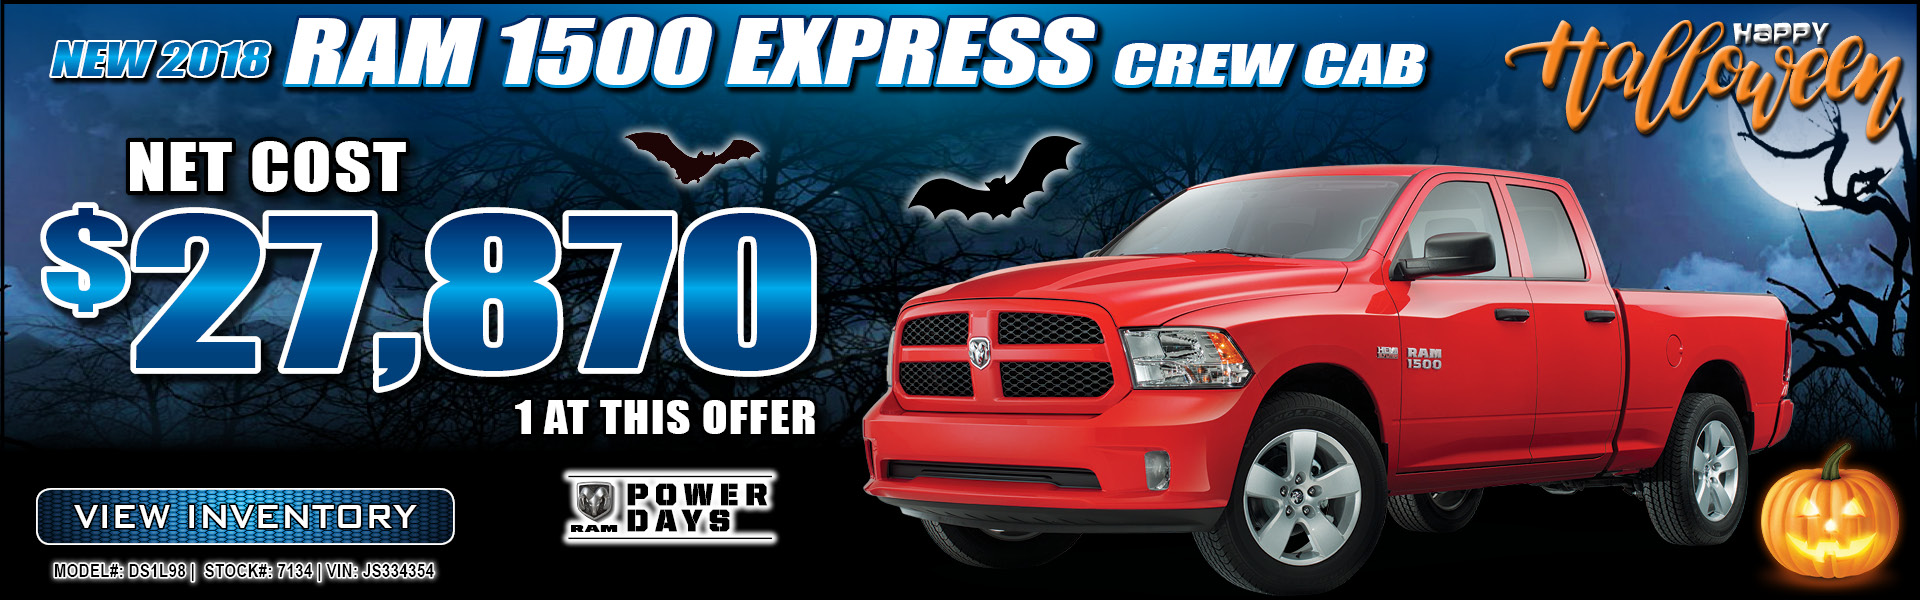 Ram 1500 Express $27,870